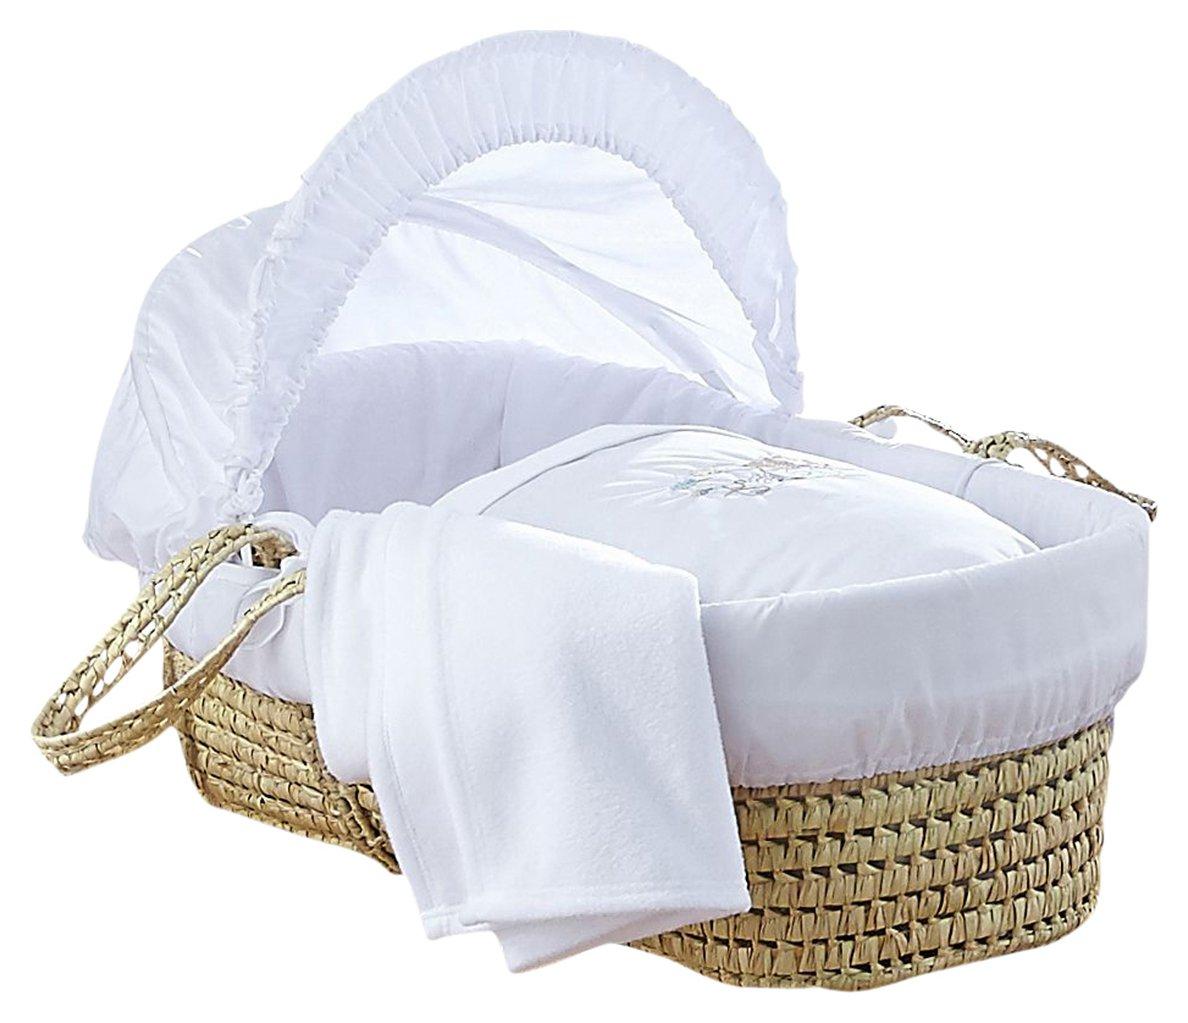 Image of Clair De Lune Baby Palm Moses Basket.